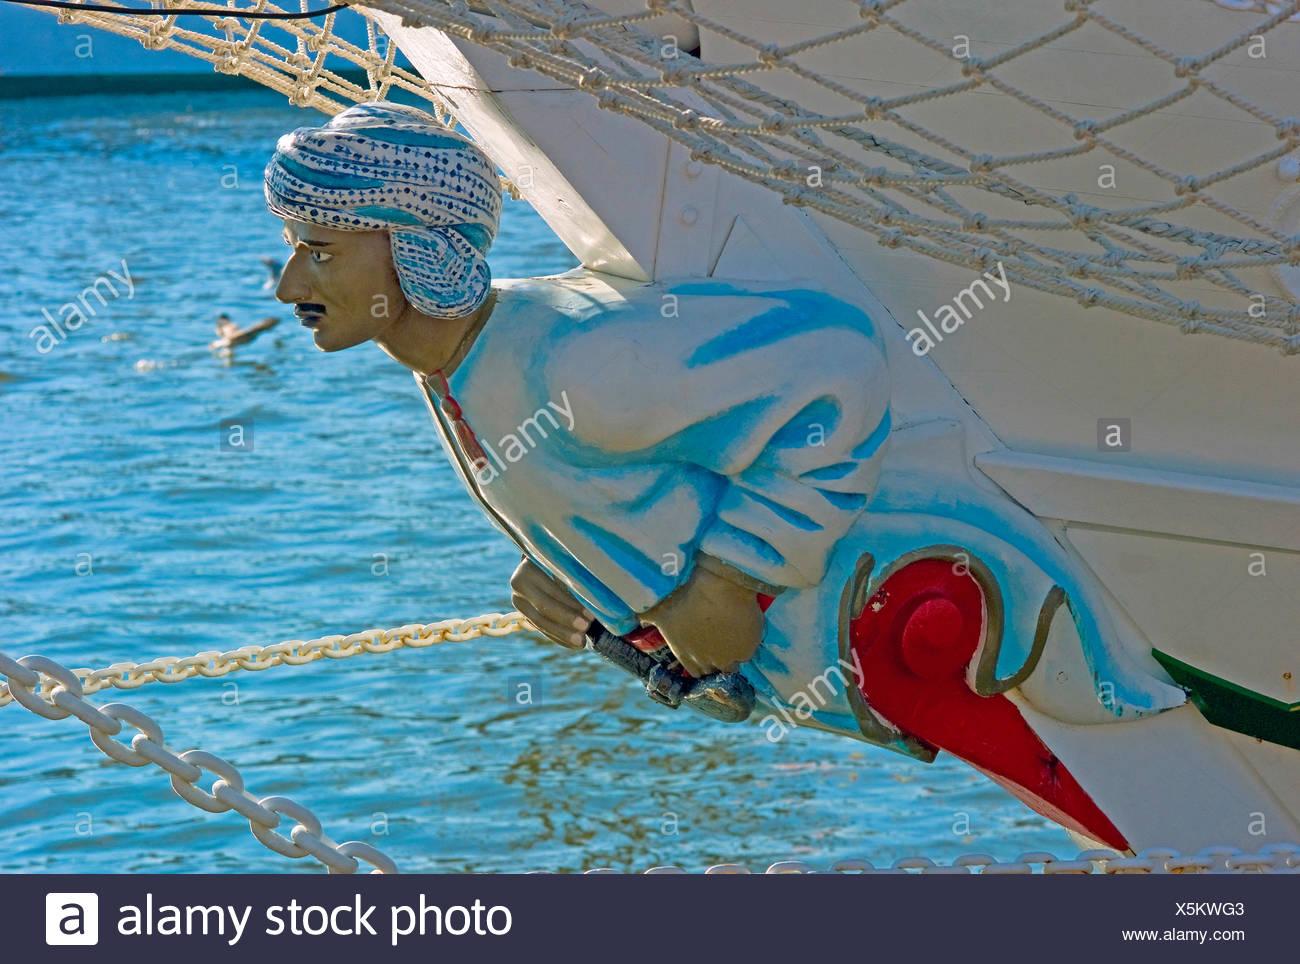 figurehead of training ship 'Shabab Oman' - Stock Image